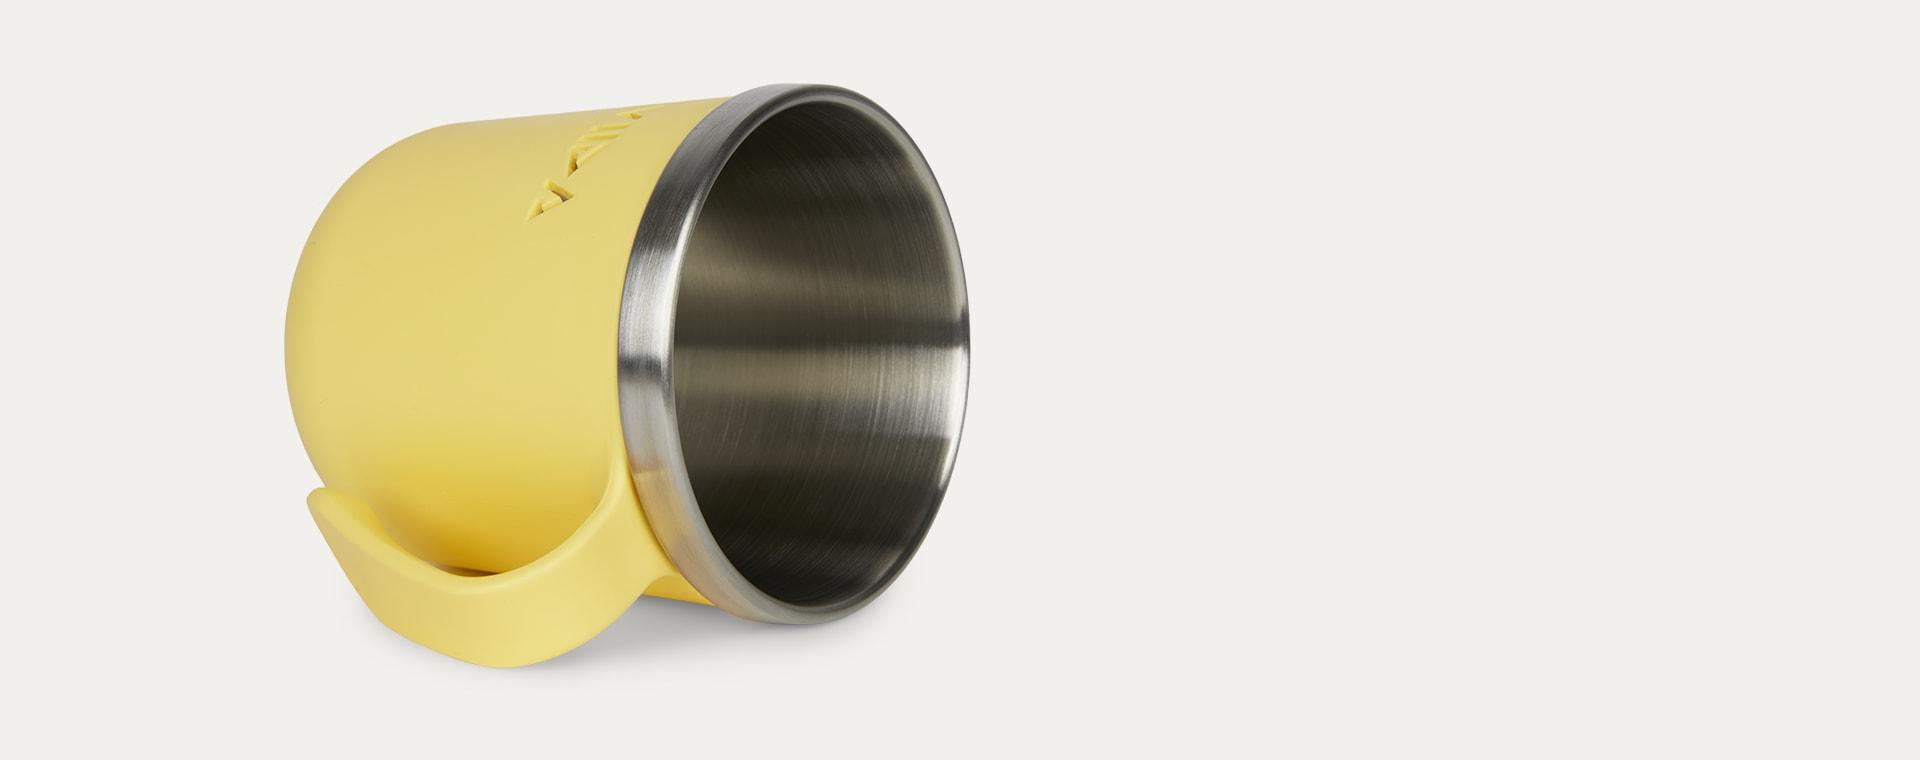 Lemon Yellow VIIDA Soufflé Antibacterial Stainless Steel Cup